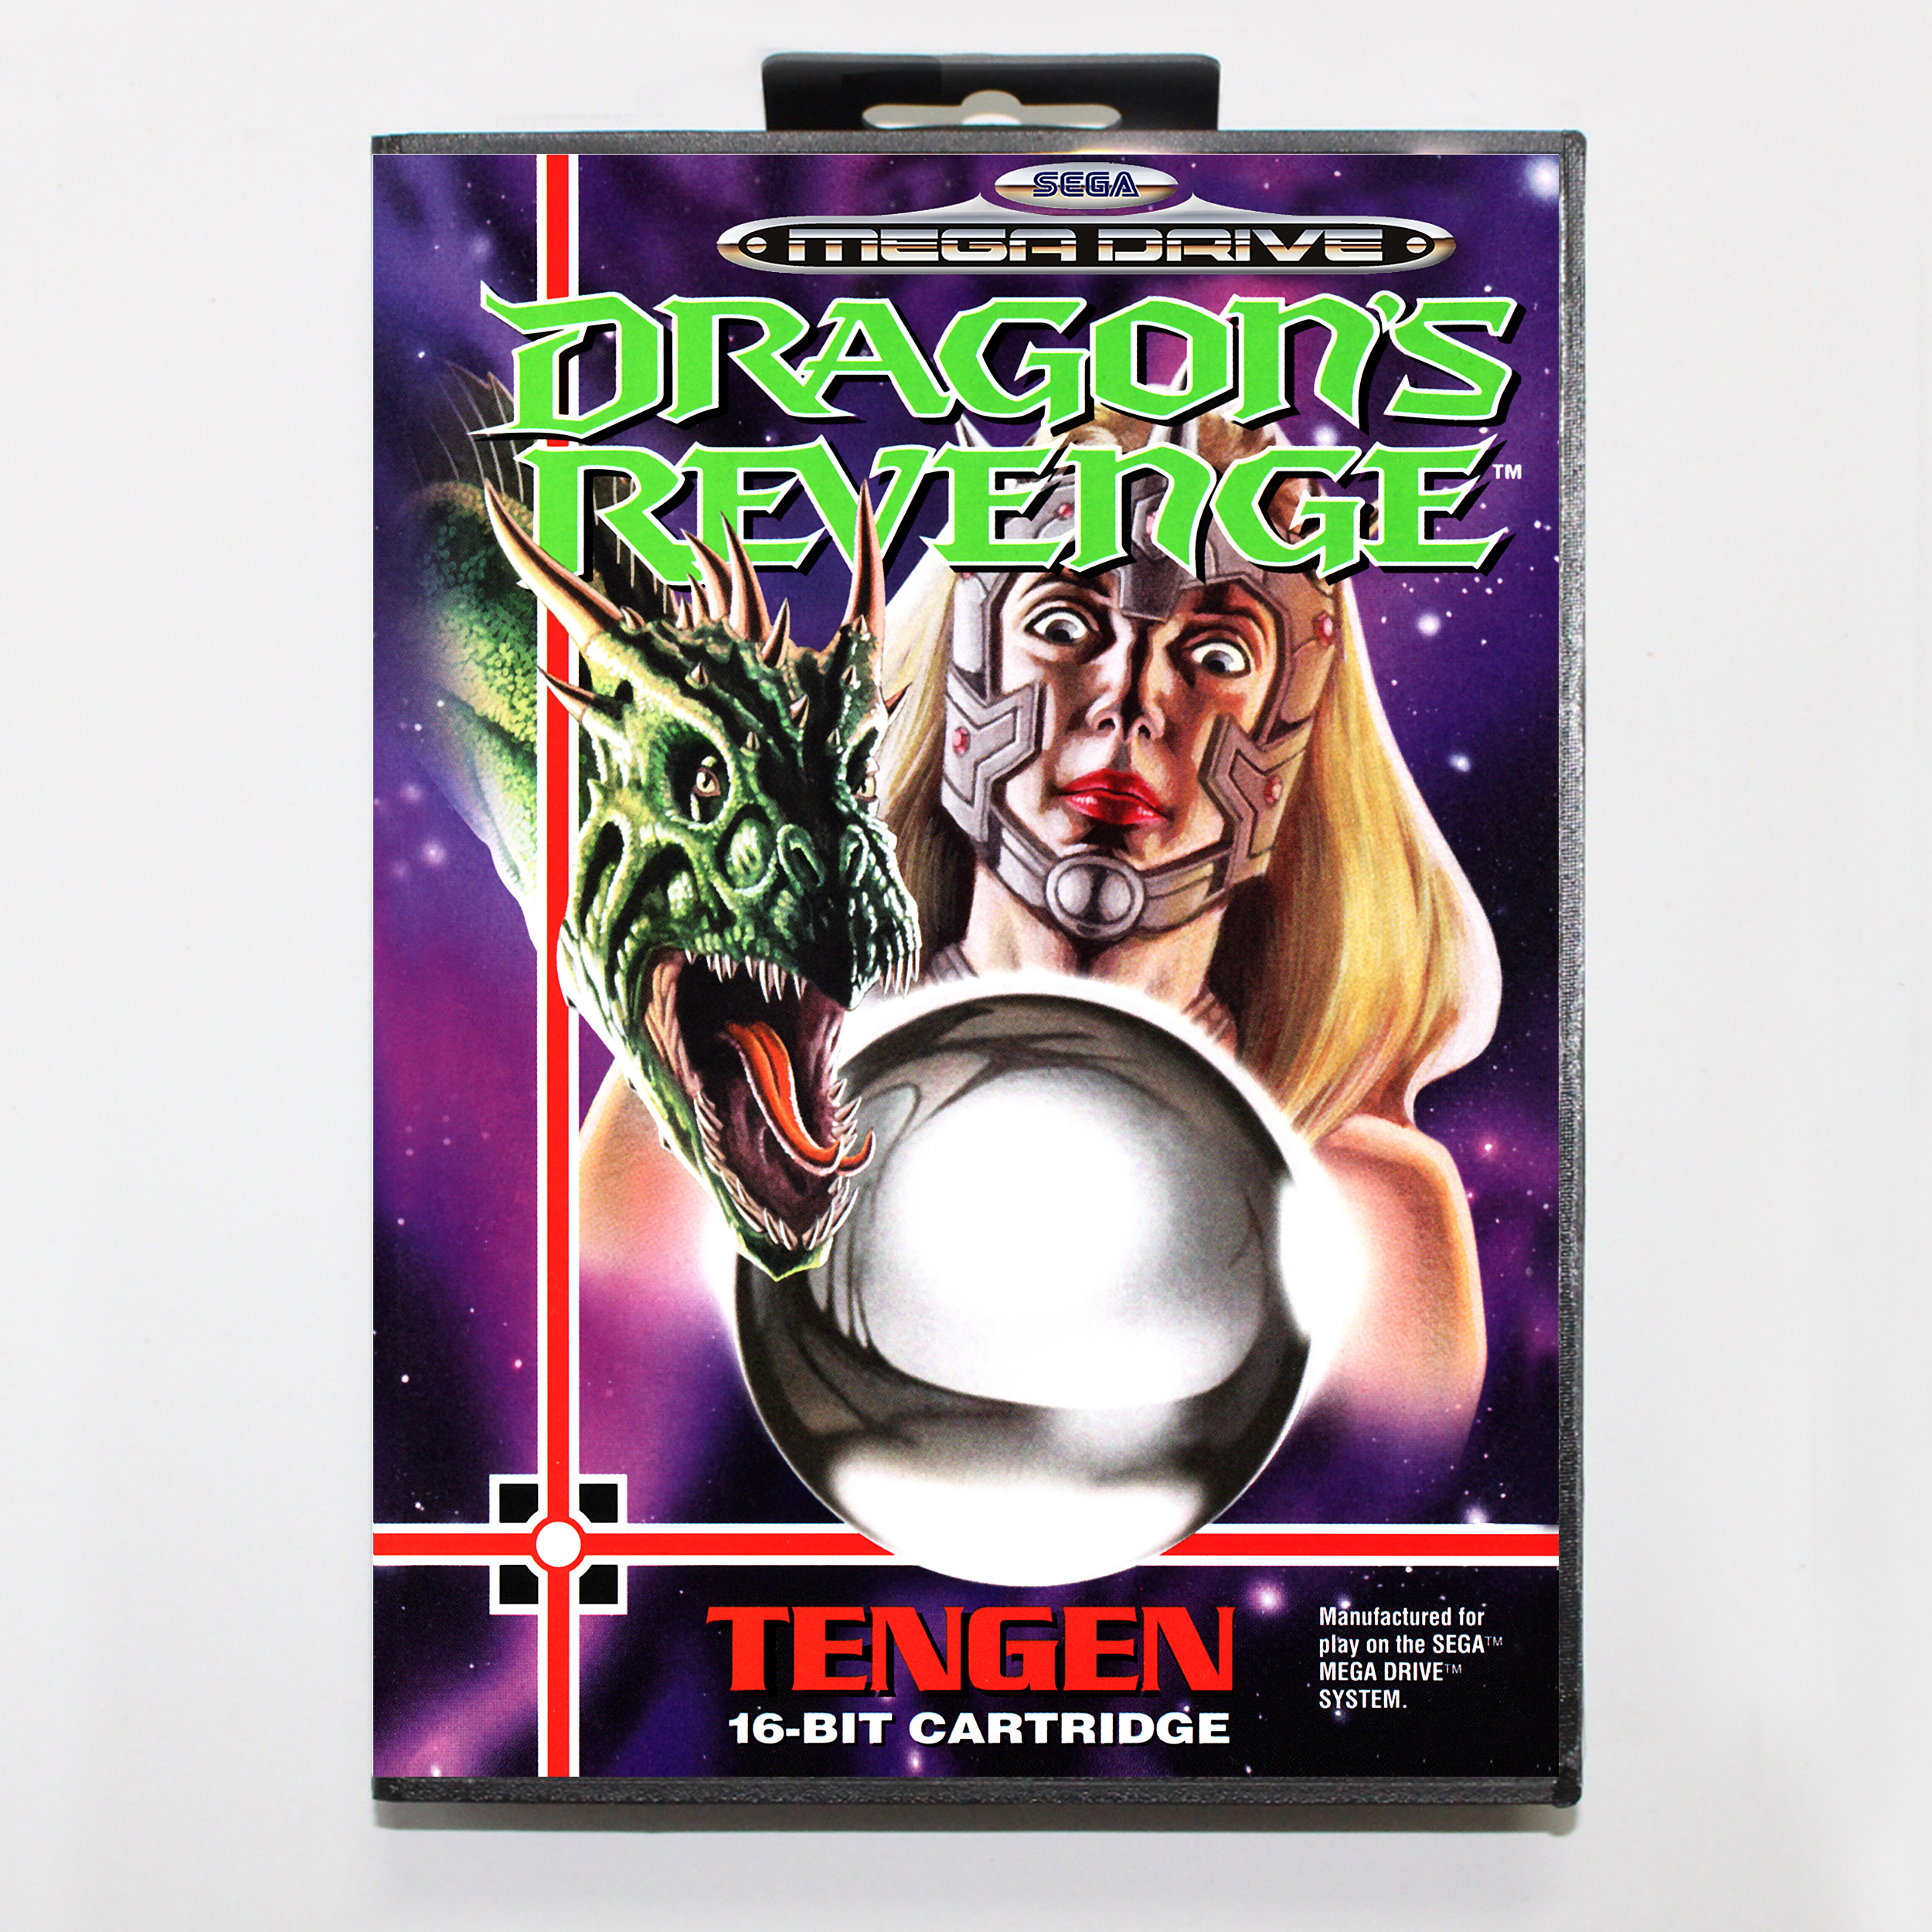 Dragon's Revenge with Retail Box 16bit MD Game Card For Sega Mega Drive/ Genesis 1